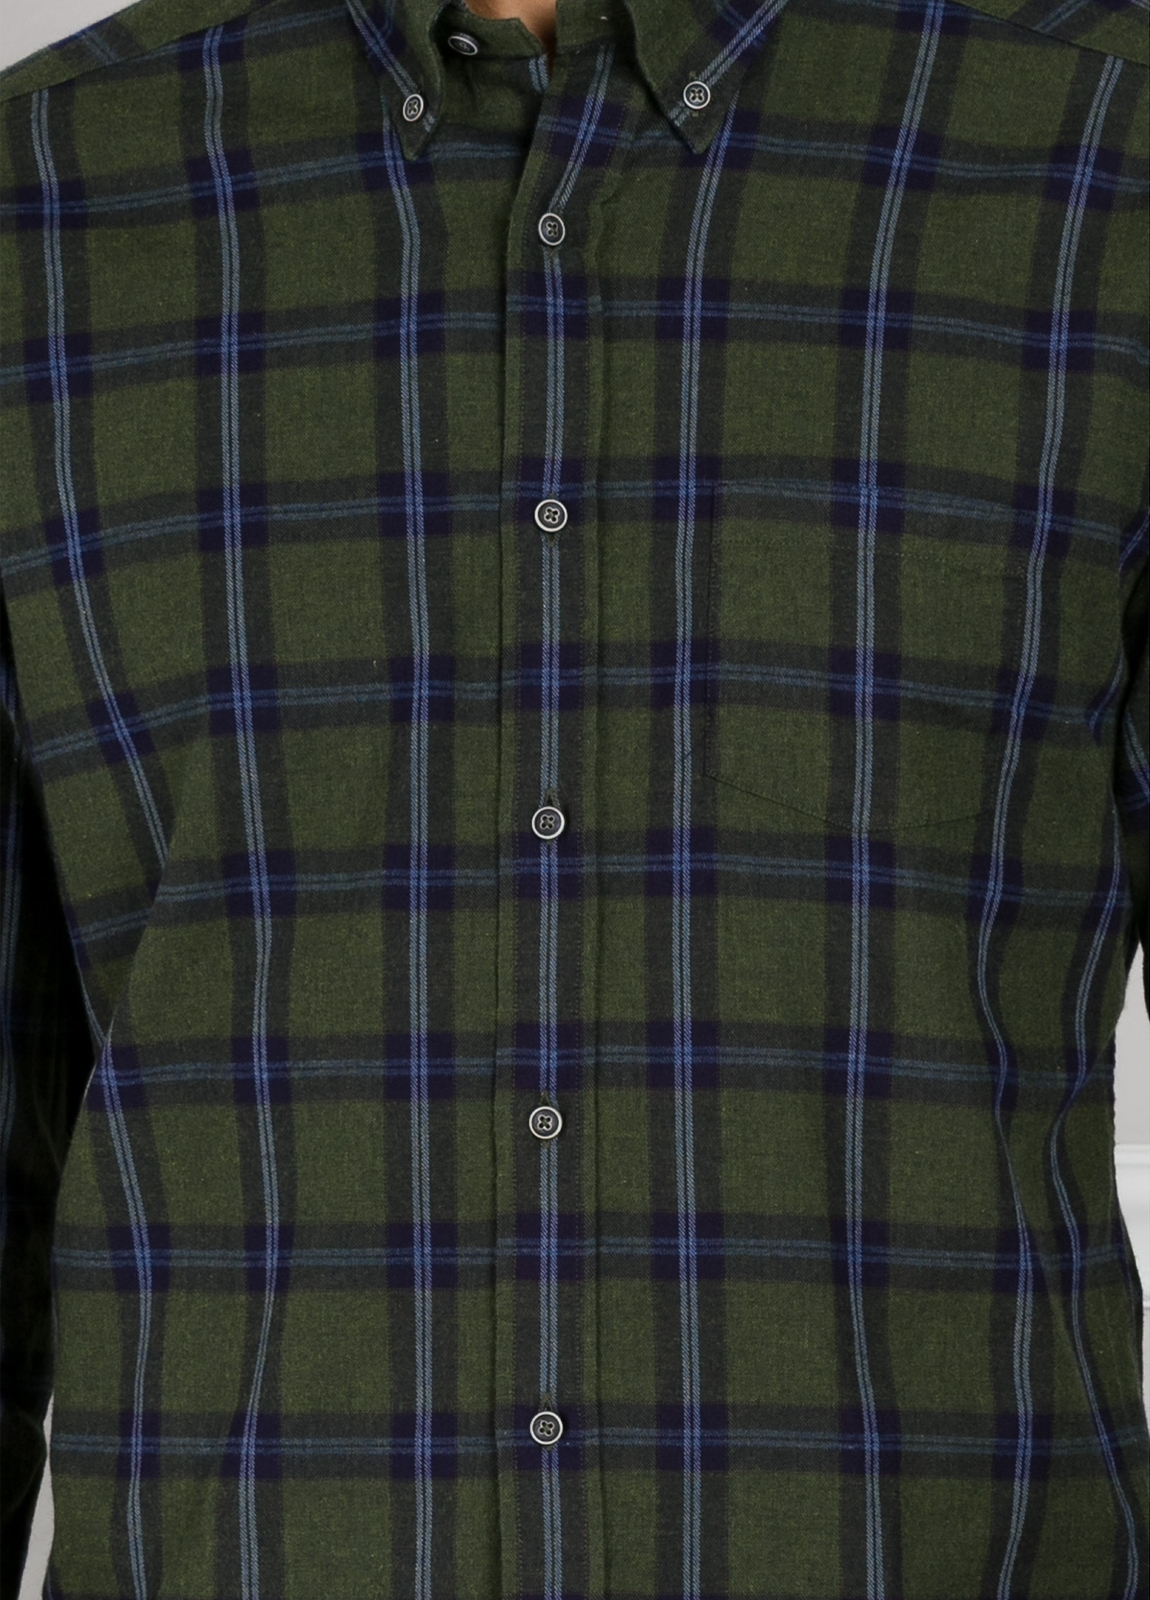 Camisa Leisure Wear REGULAR FIT Modelo BOTTON DOWN cuadros color verde. 100% Algodón. - Ítem1